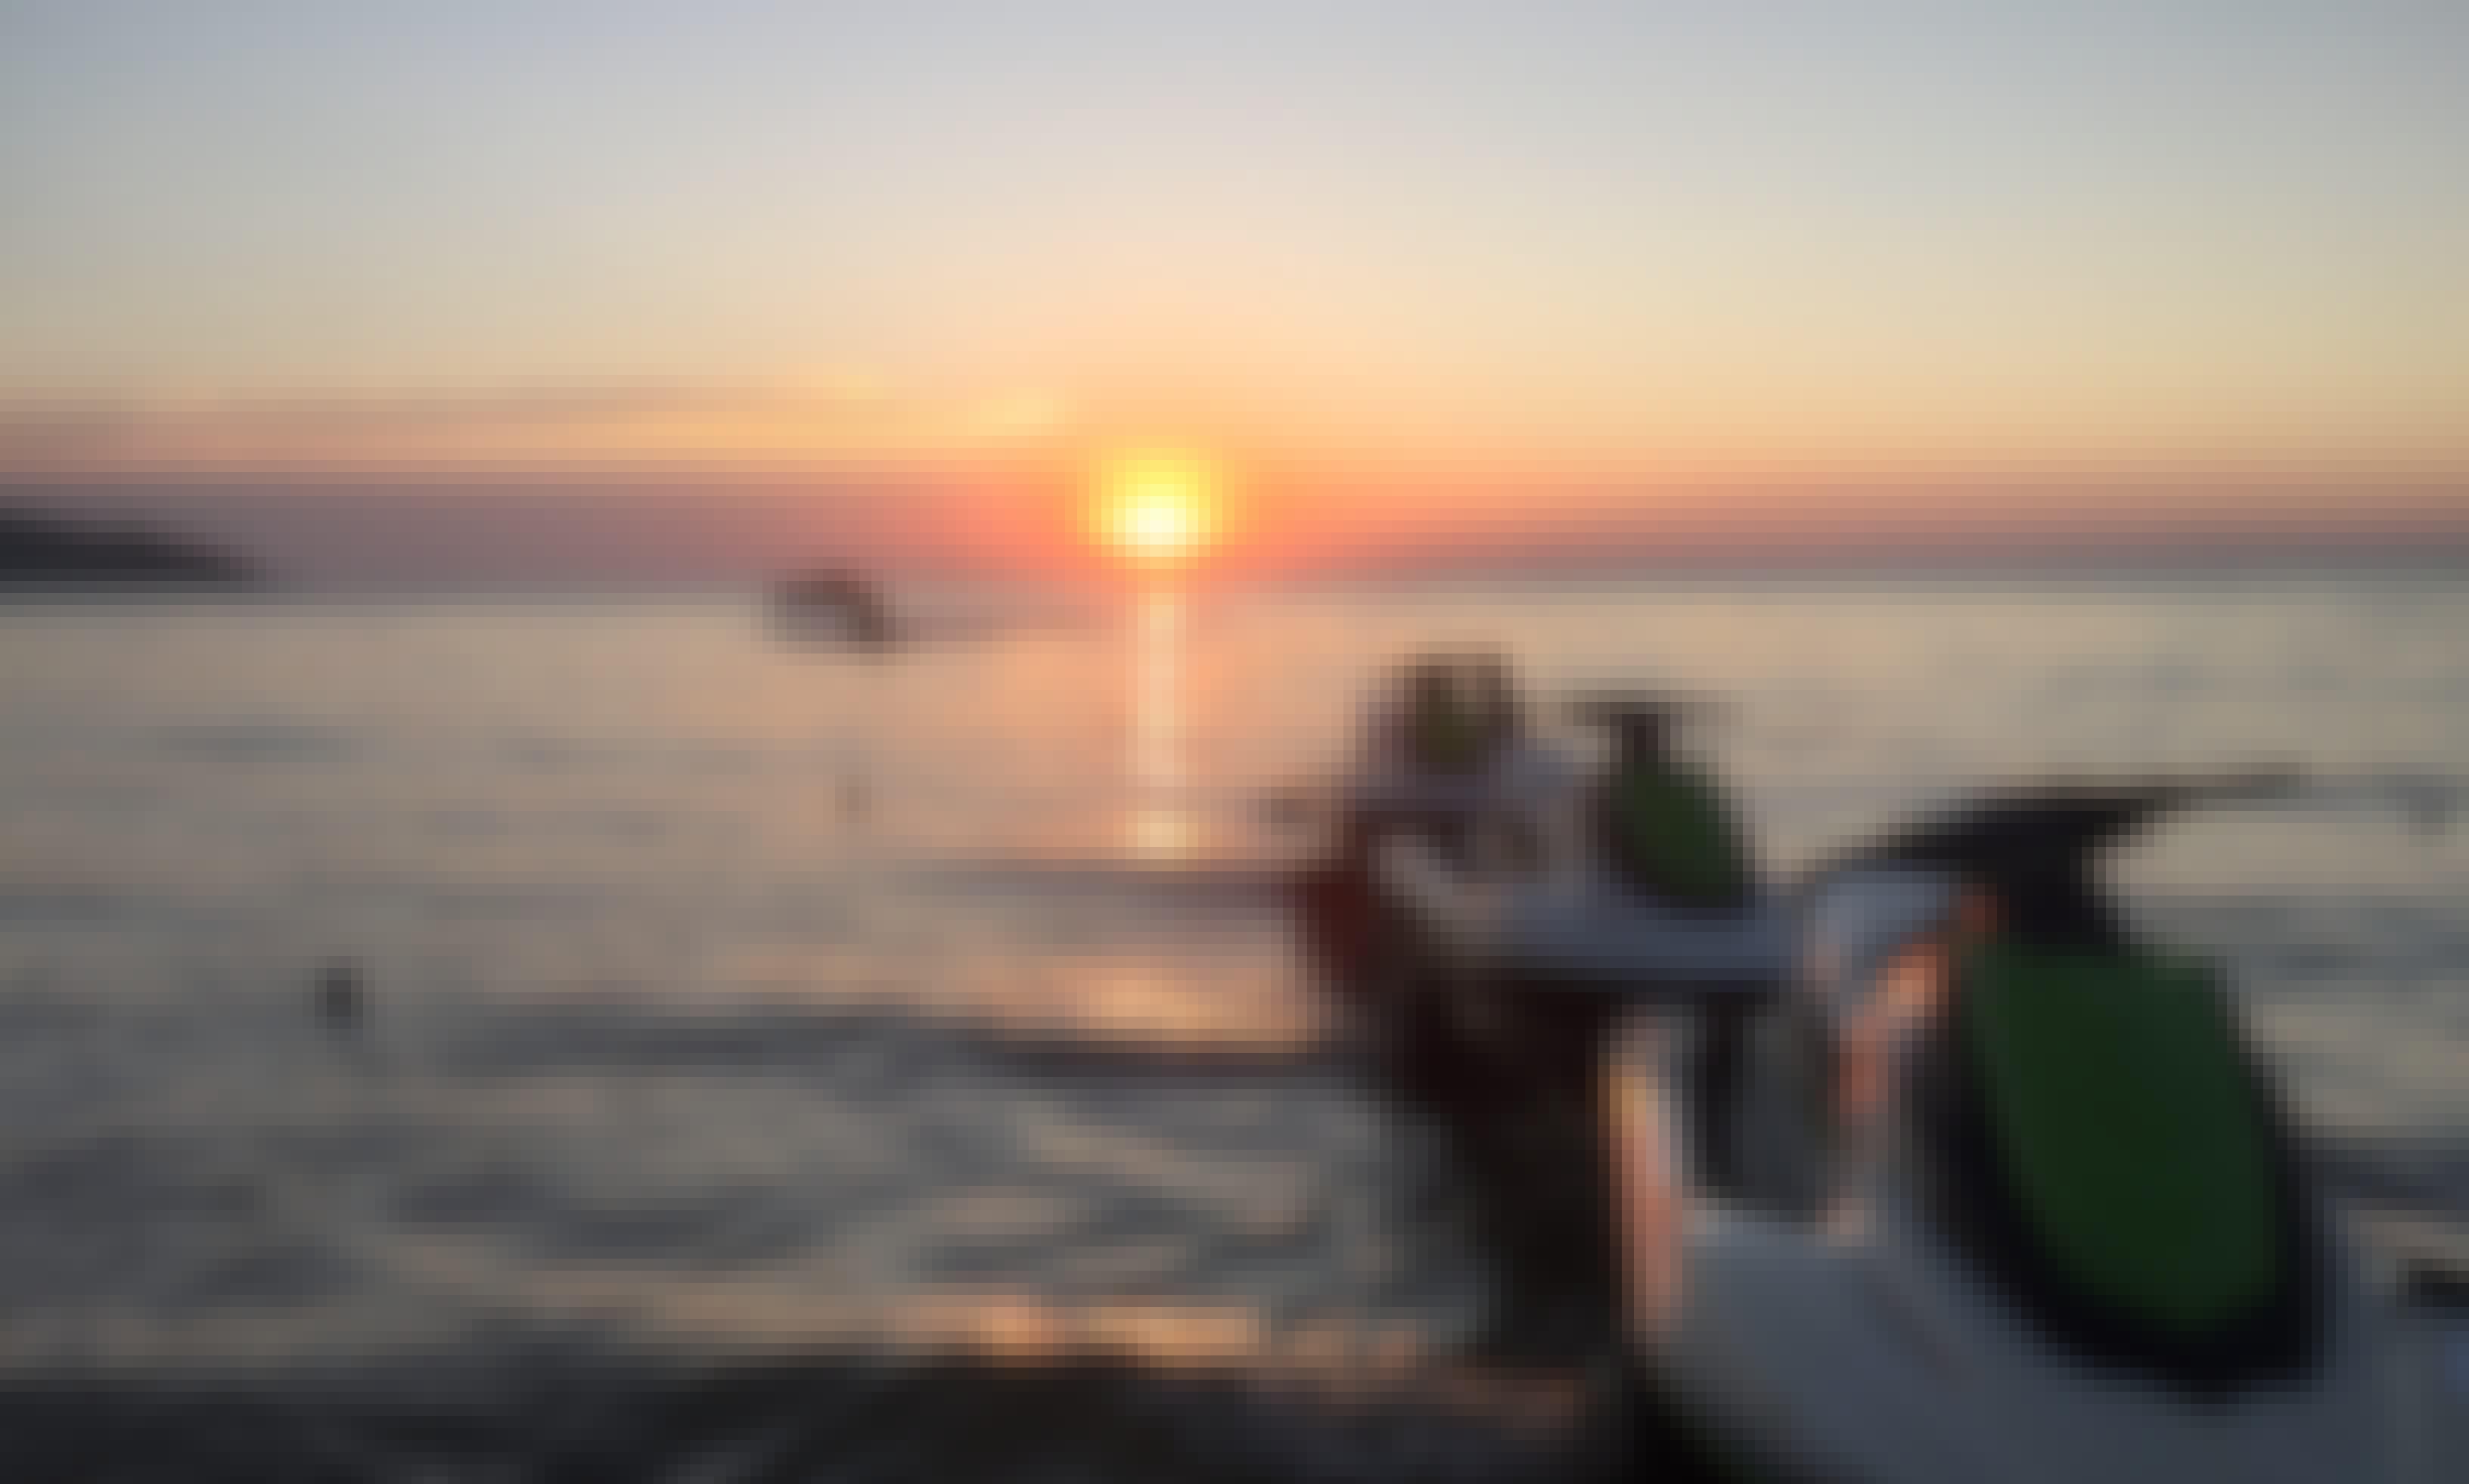 Sunset Photography by Jetski Lipa Noi Beach Koh Samui Thailand